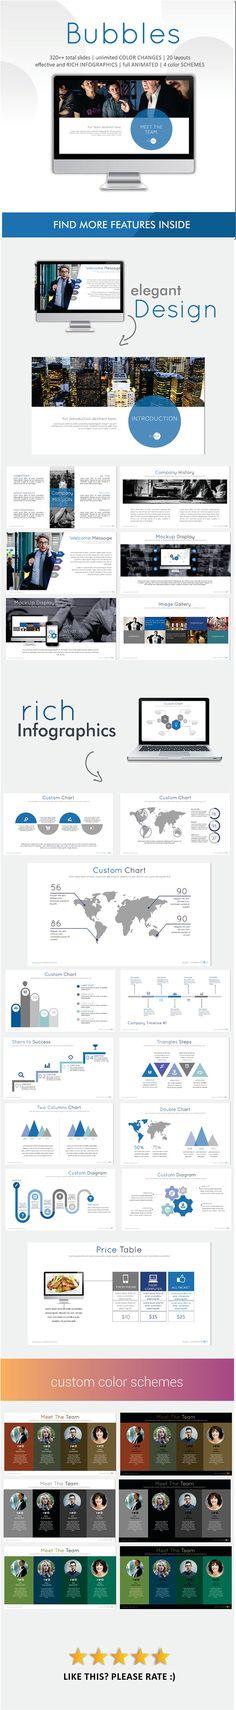 Clean Cream PowerPoint Presentation #graph #startup u2022 Click here - resume presentation